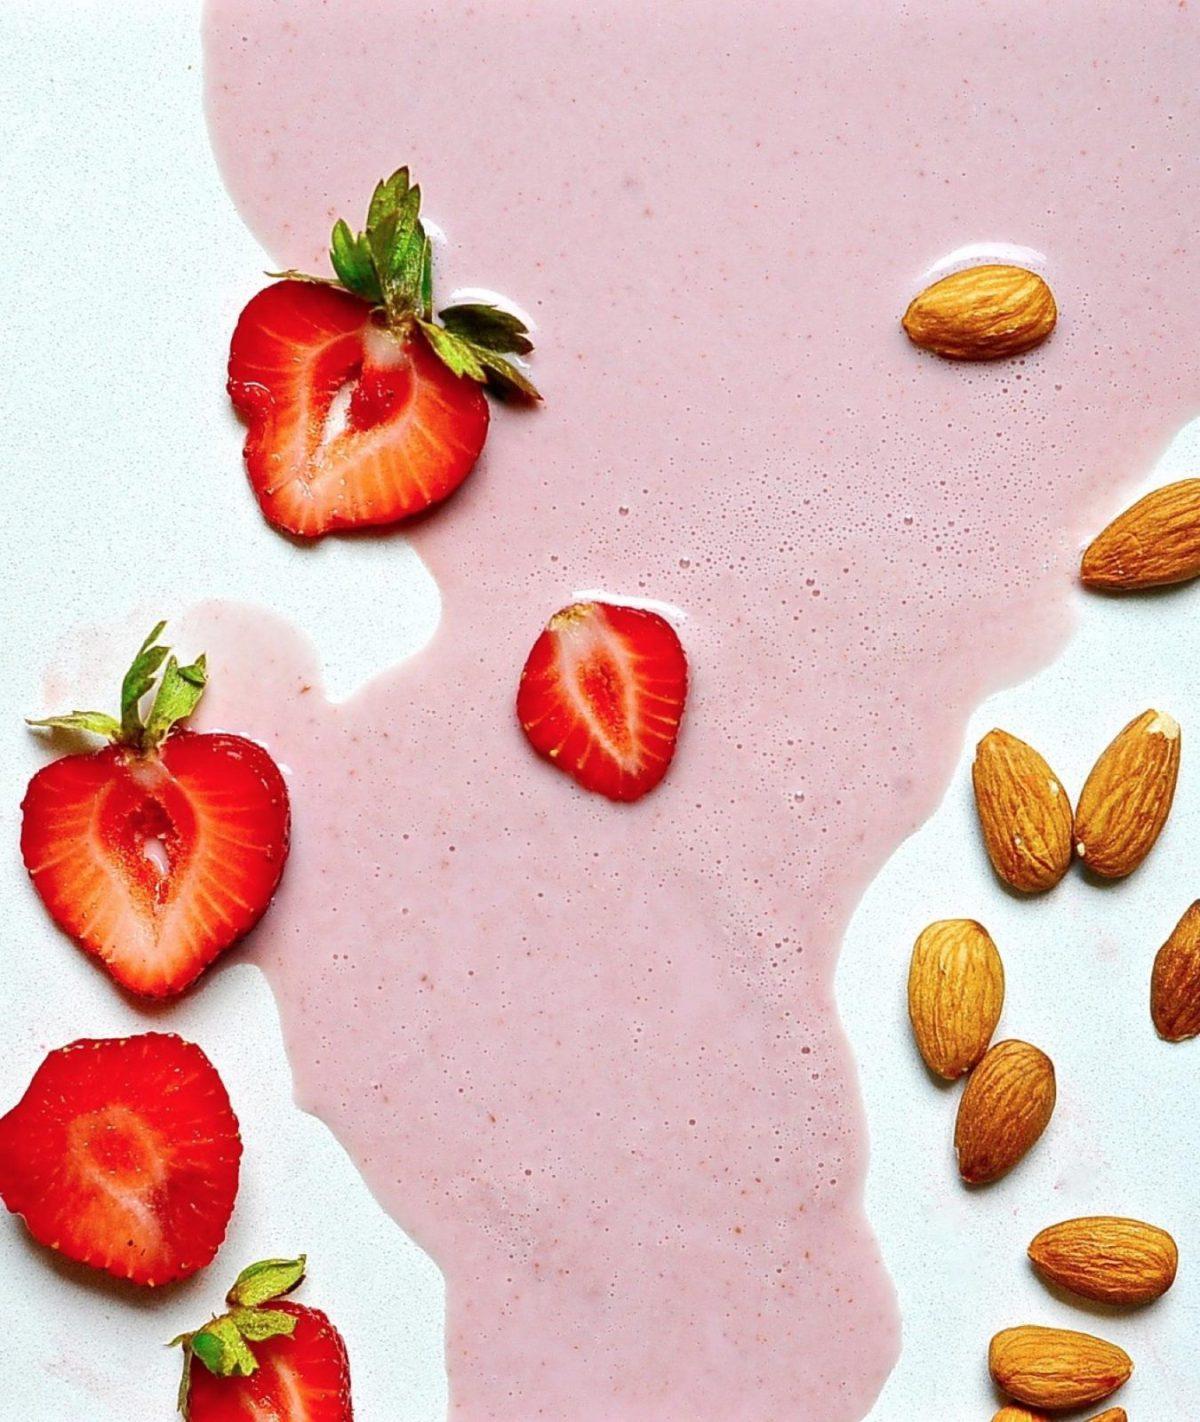 Strawberry Almond Milk (Vegan, Paleo)